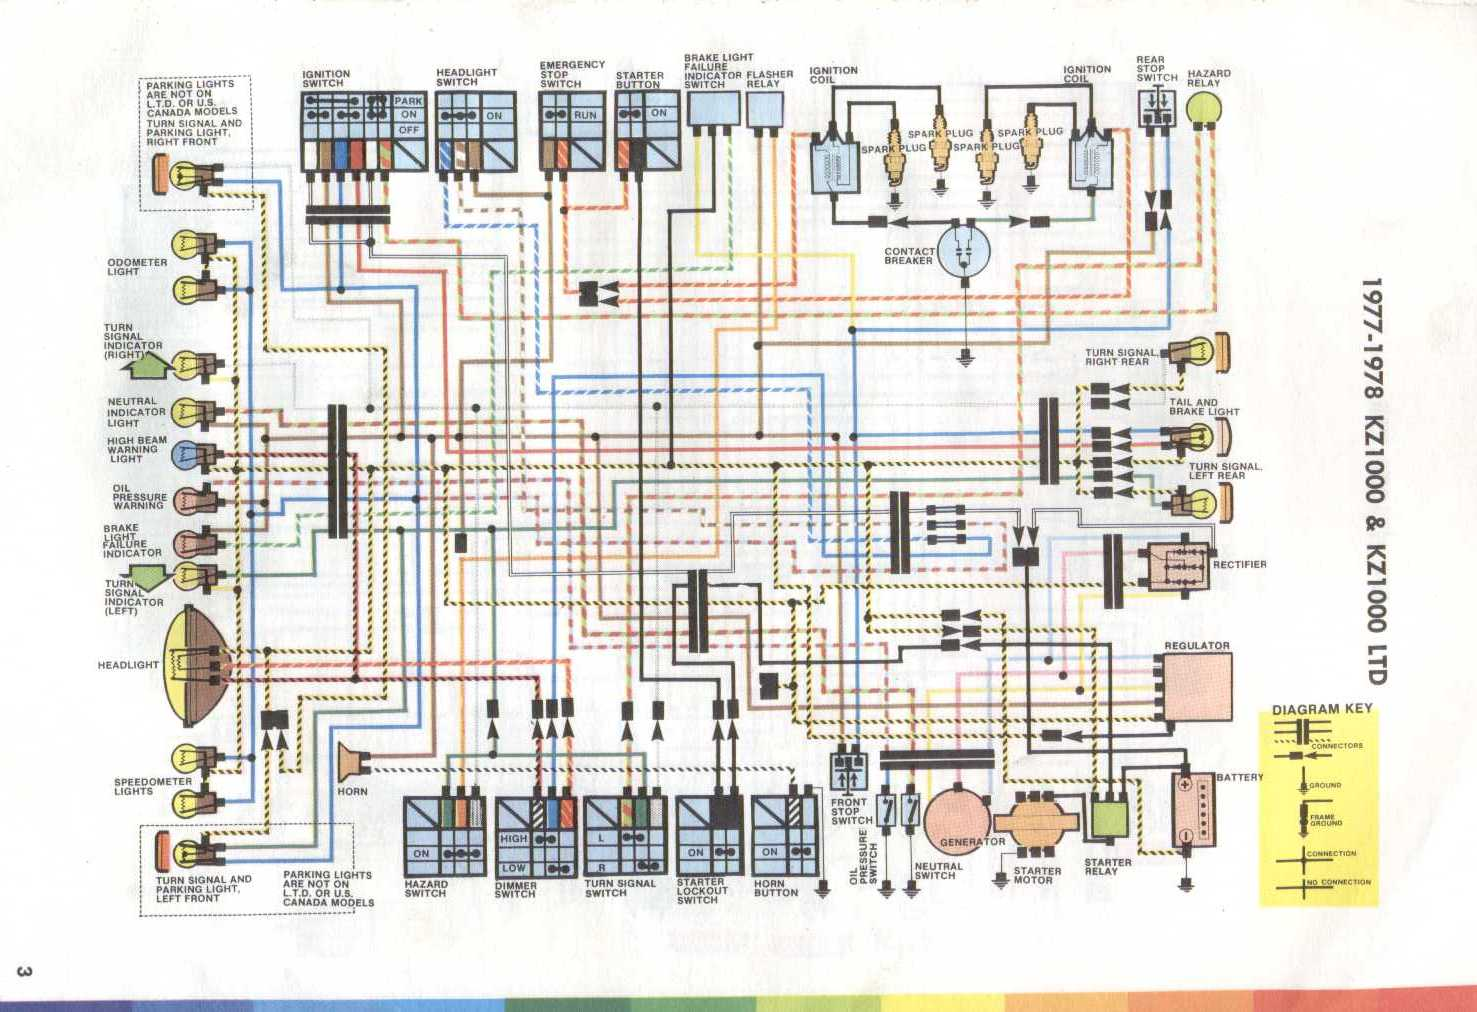 GM_5954] 77 Kawasaki Kz1000 Wiring Diagram Wiring DiagramIntel Phot Bocep Frag Animo Umize Hapolo Mohammedshrine Librar Wiring 101